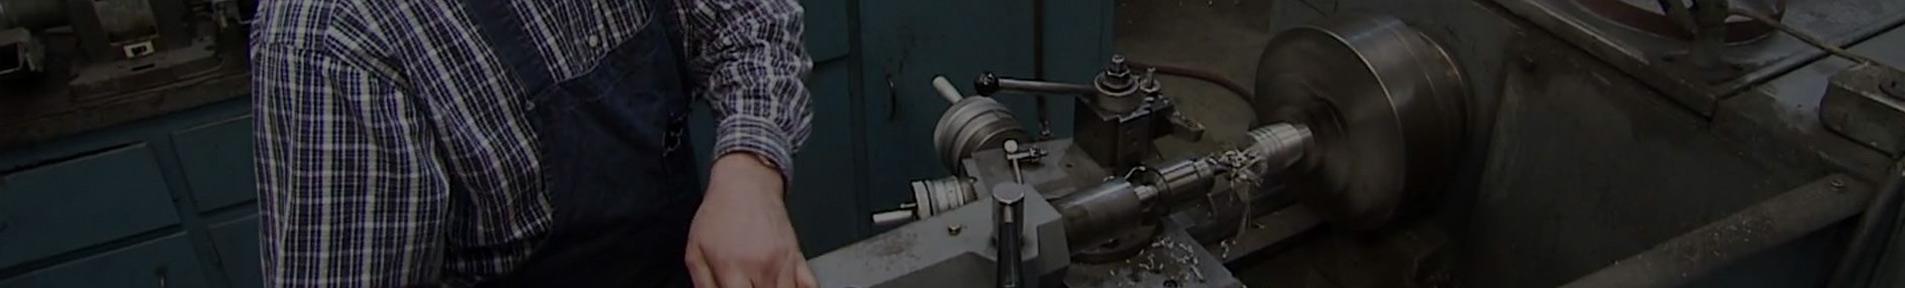 Prodaja mašina - Tool Grinders